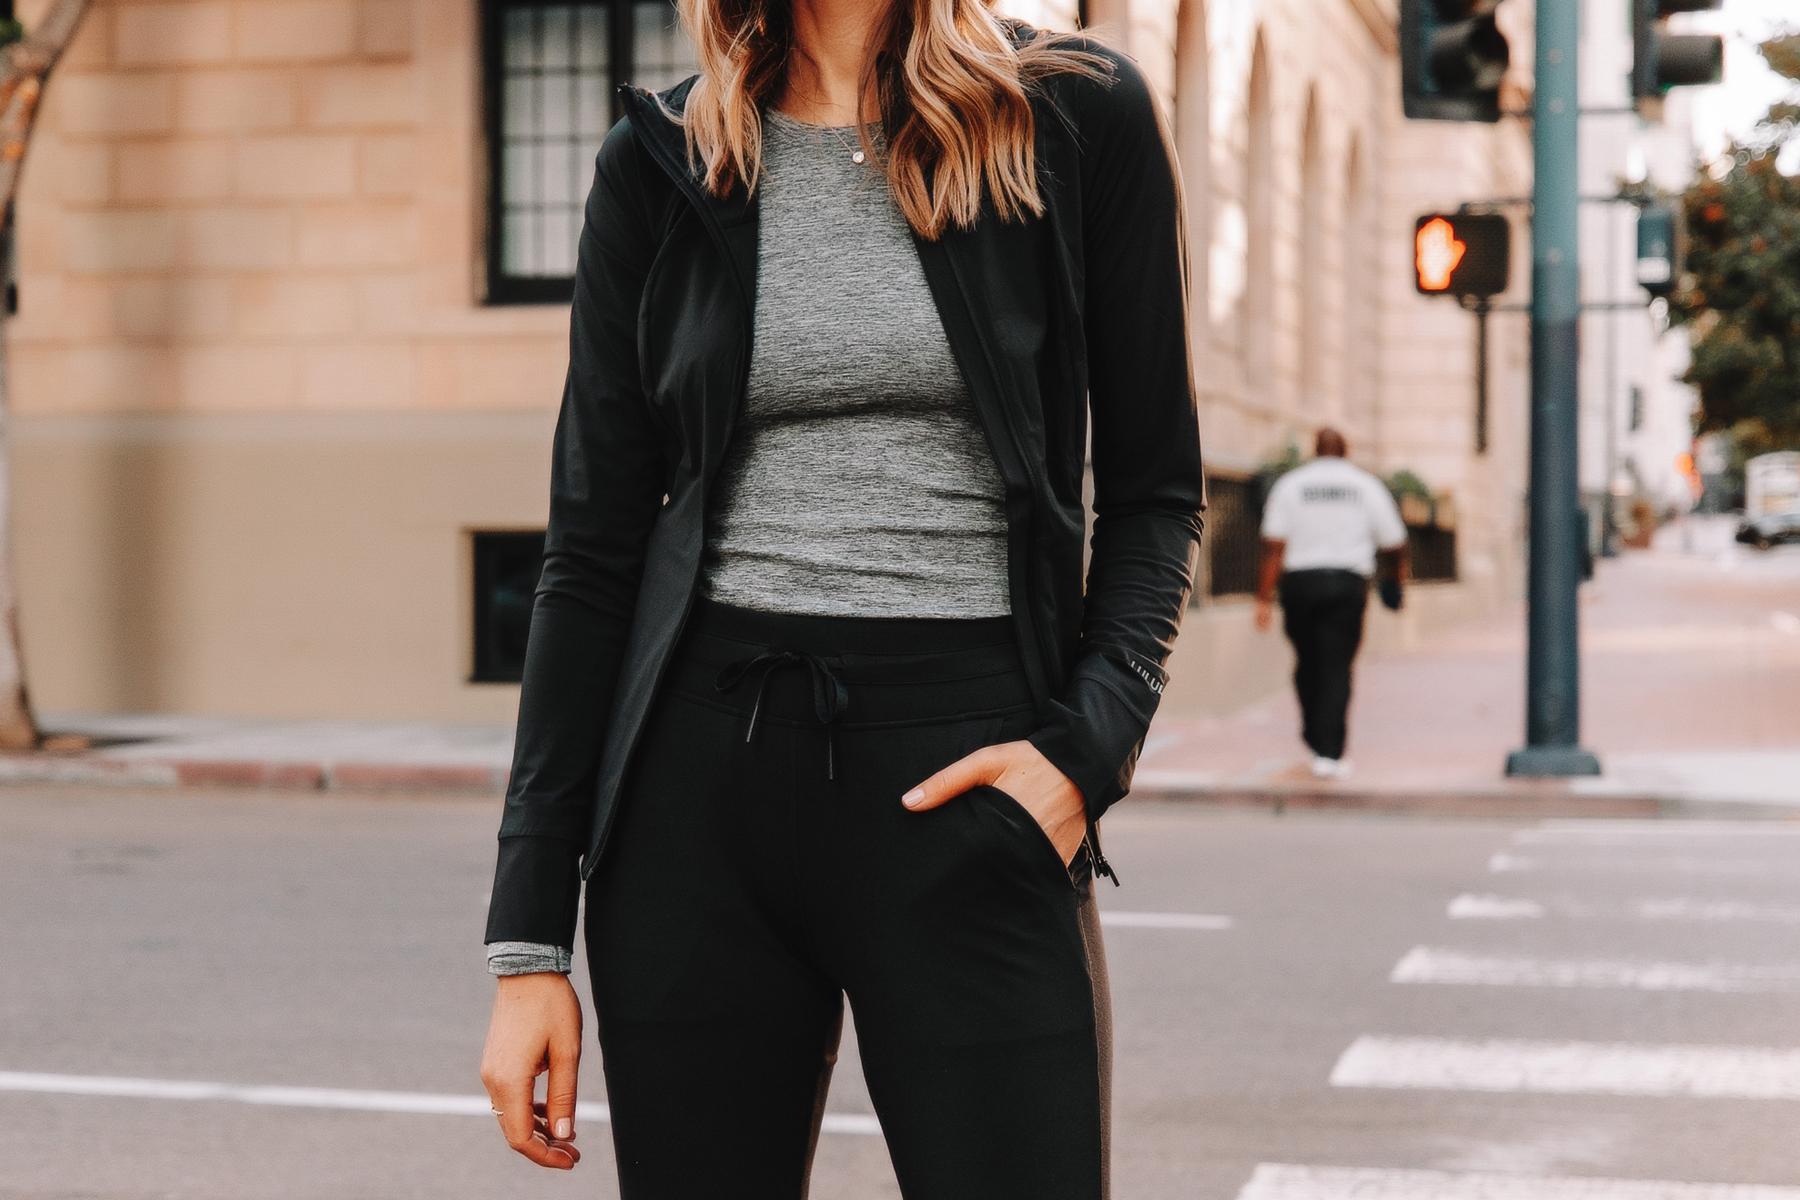 Fashion Jackson Wearing lululemon Black Jacket Grey Workout Top Black Joggers